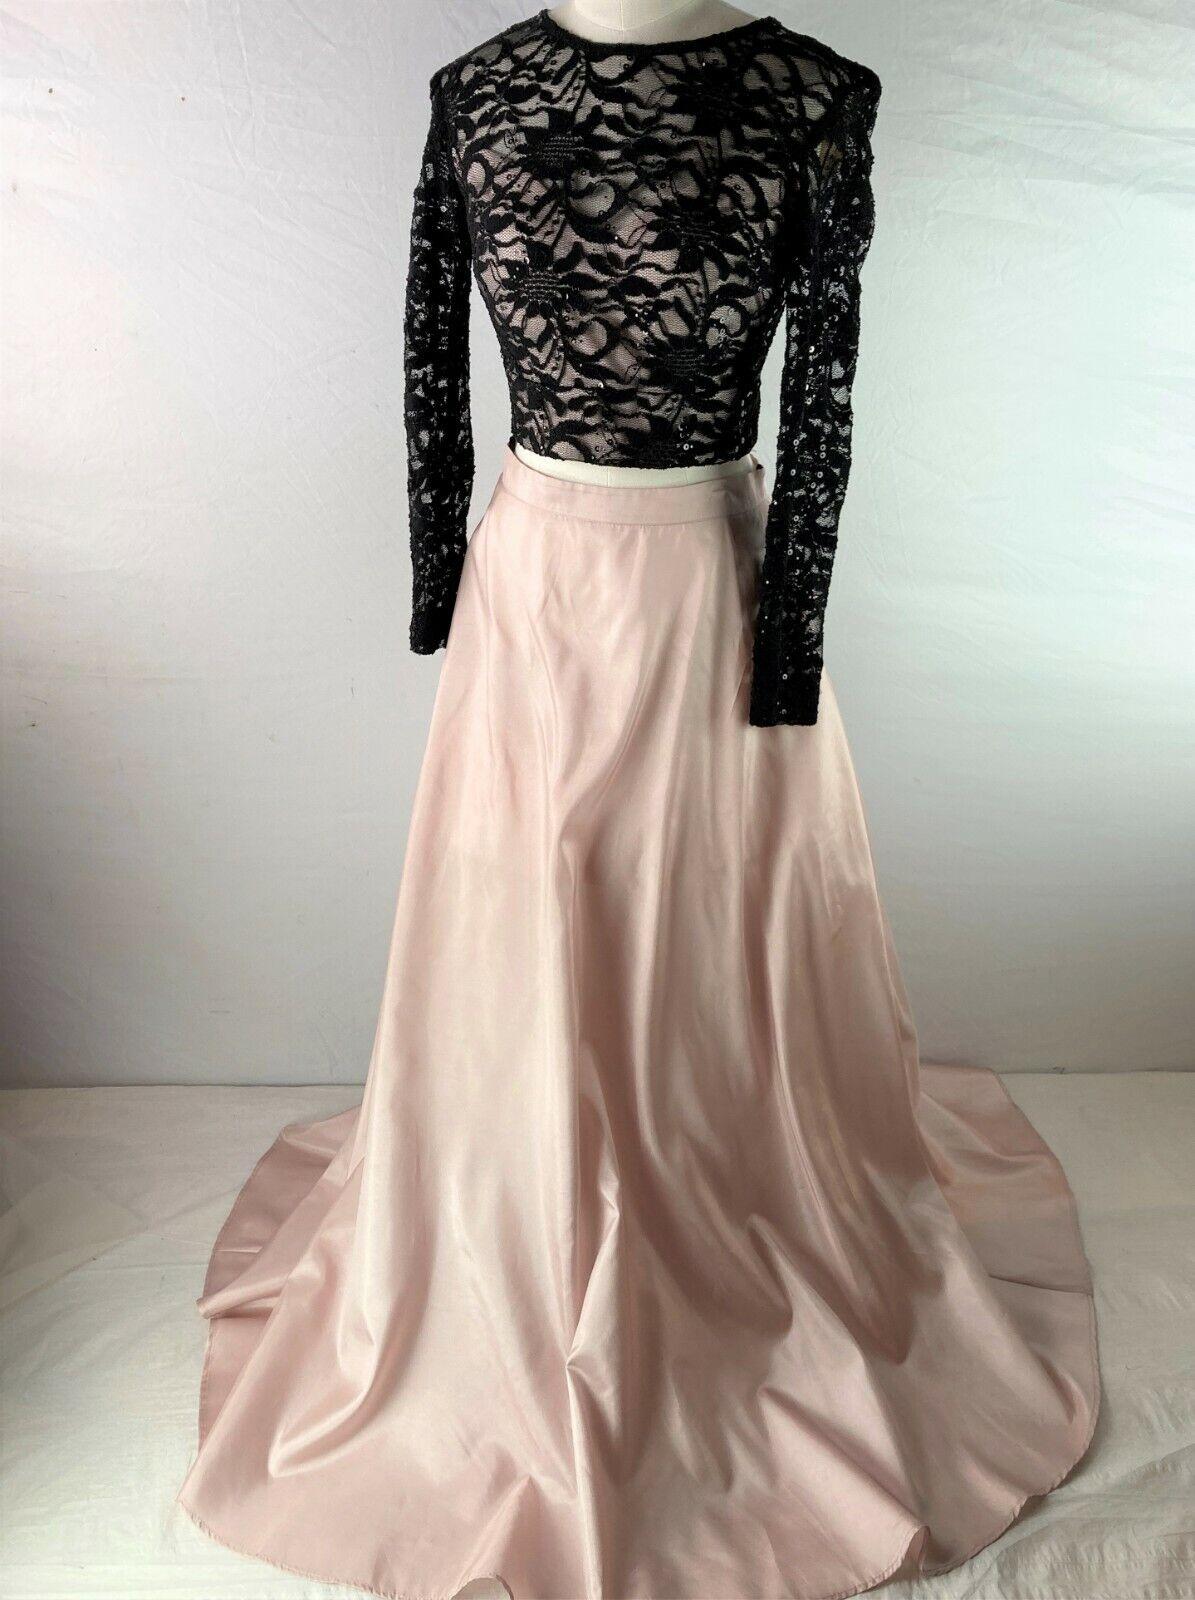 WINDSOR 2-Piece Prom Dress Formal Ballgown, Black Lace, Pink Satin, Women sz 5/6